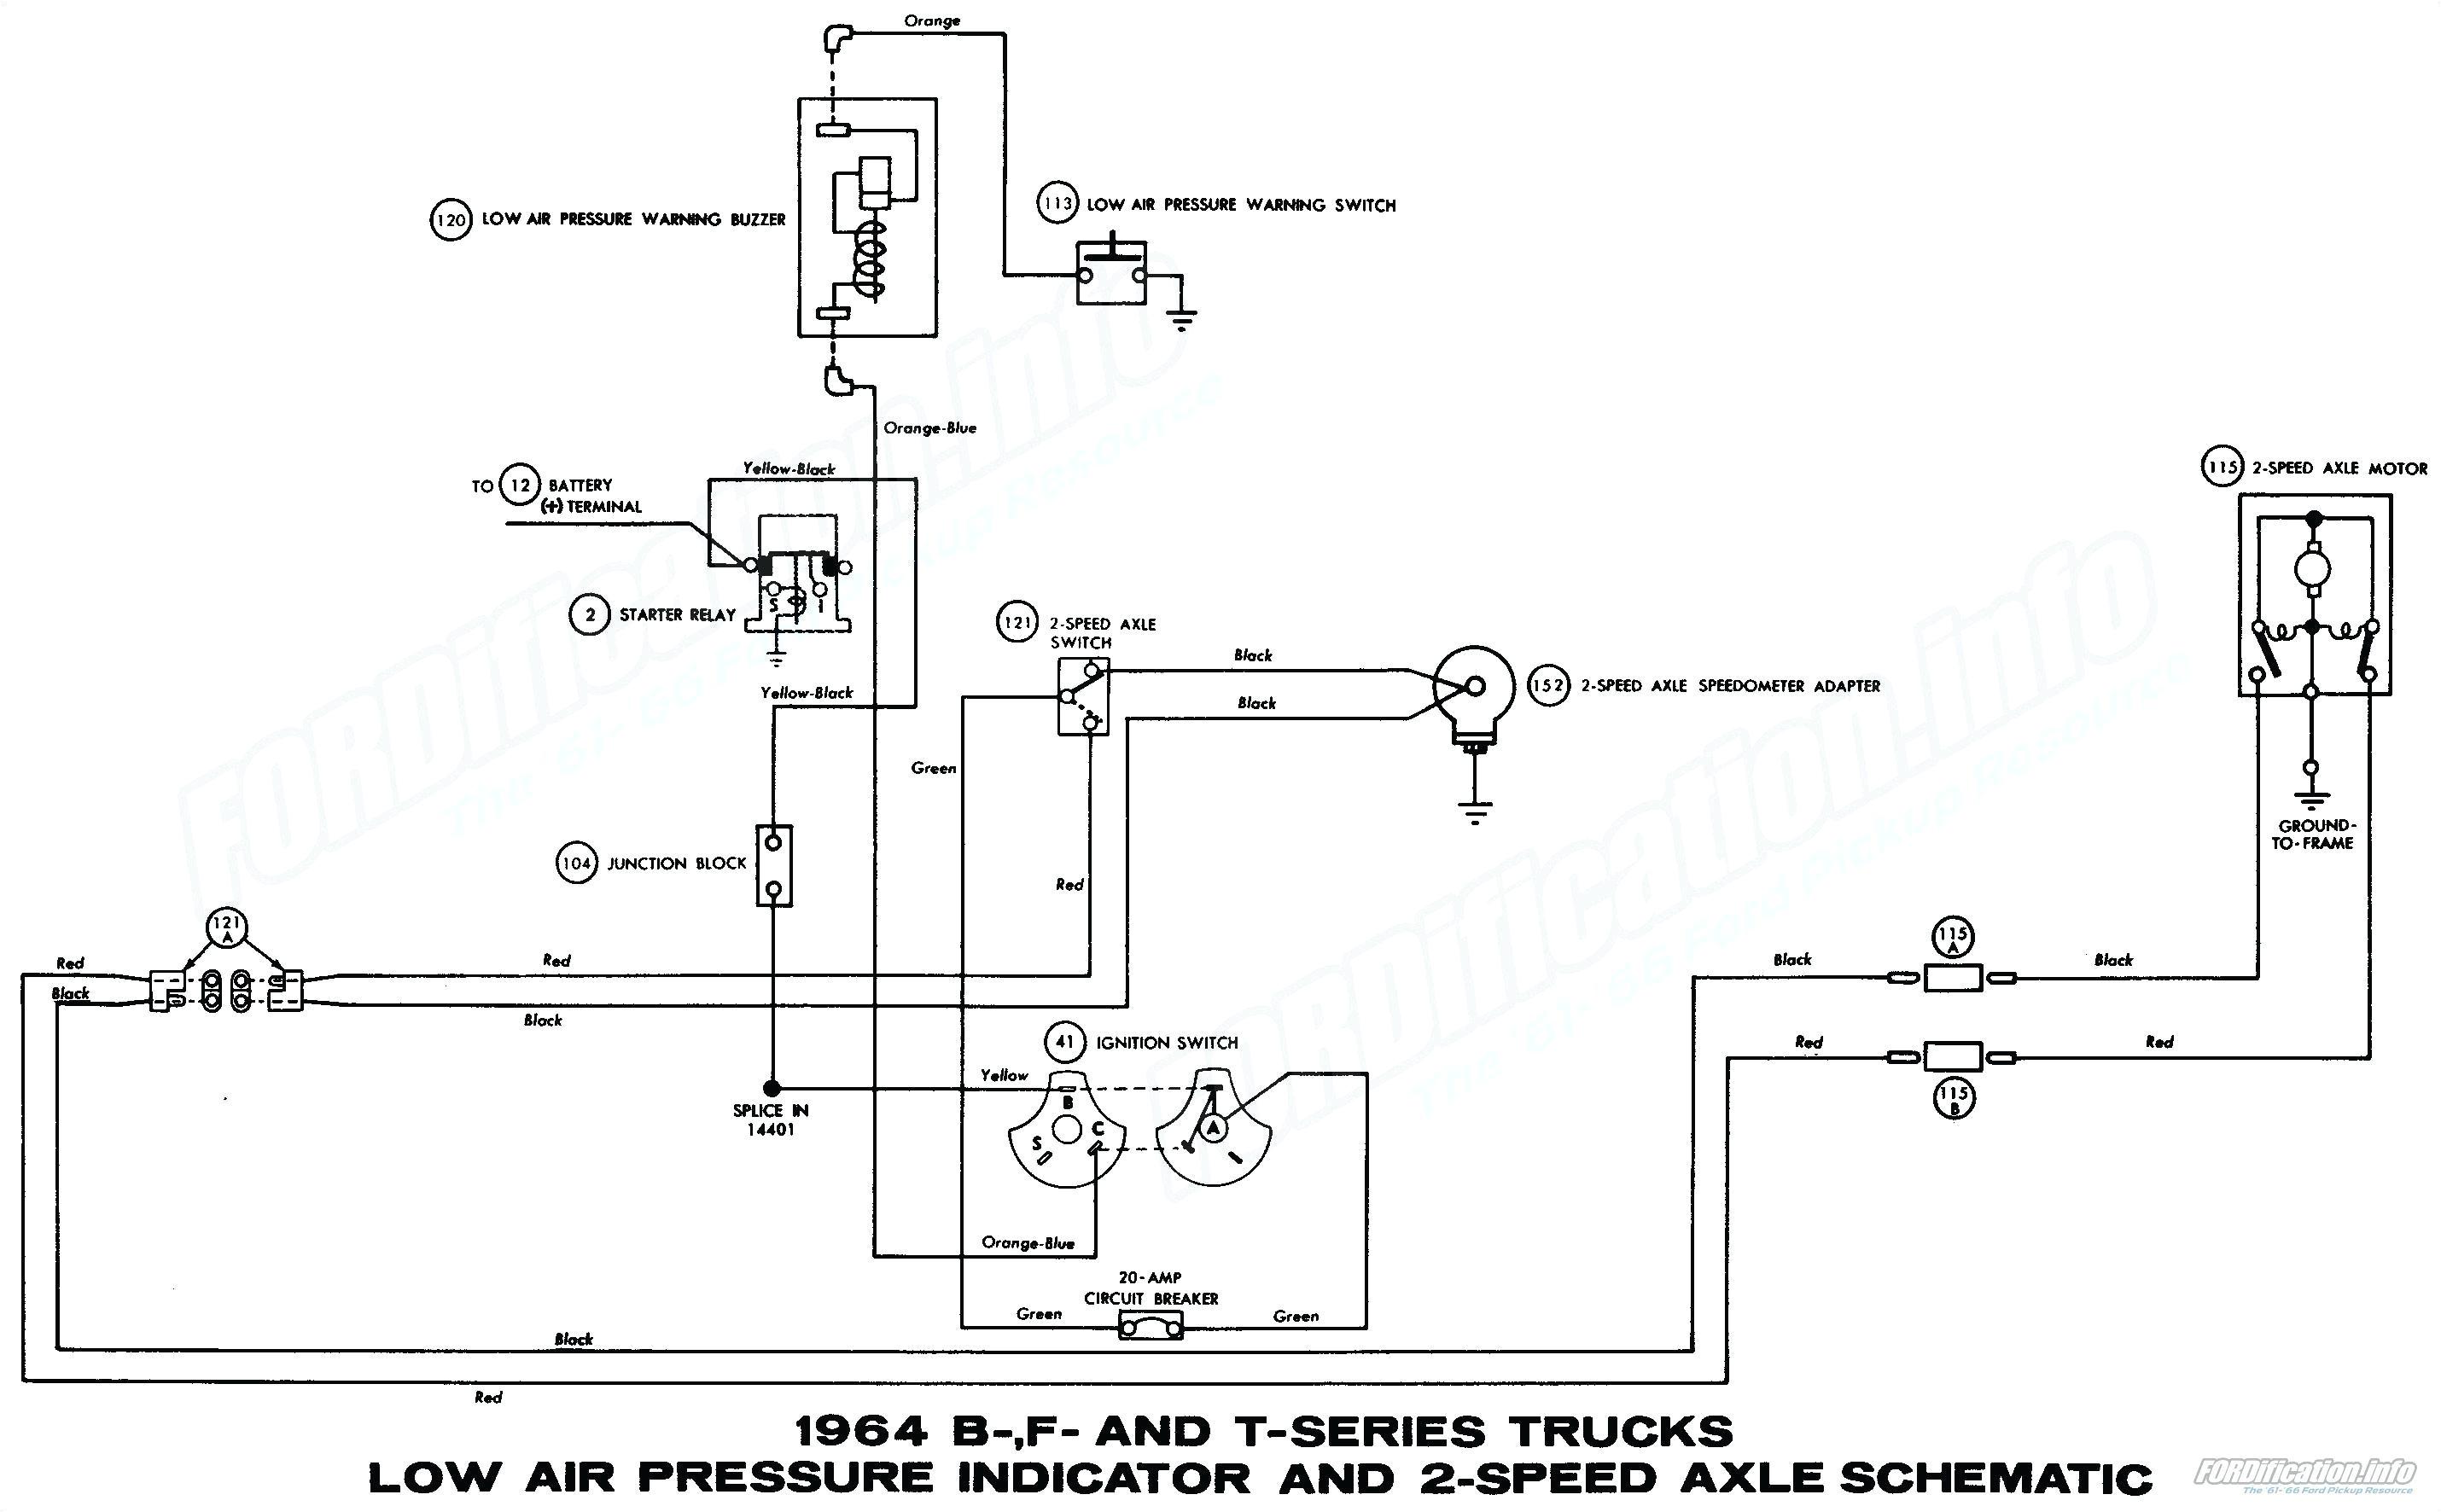 220 110 air compressor wiring diagram wiring diagram ame 220 air compressor wiring diagram